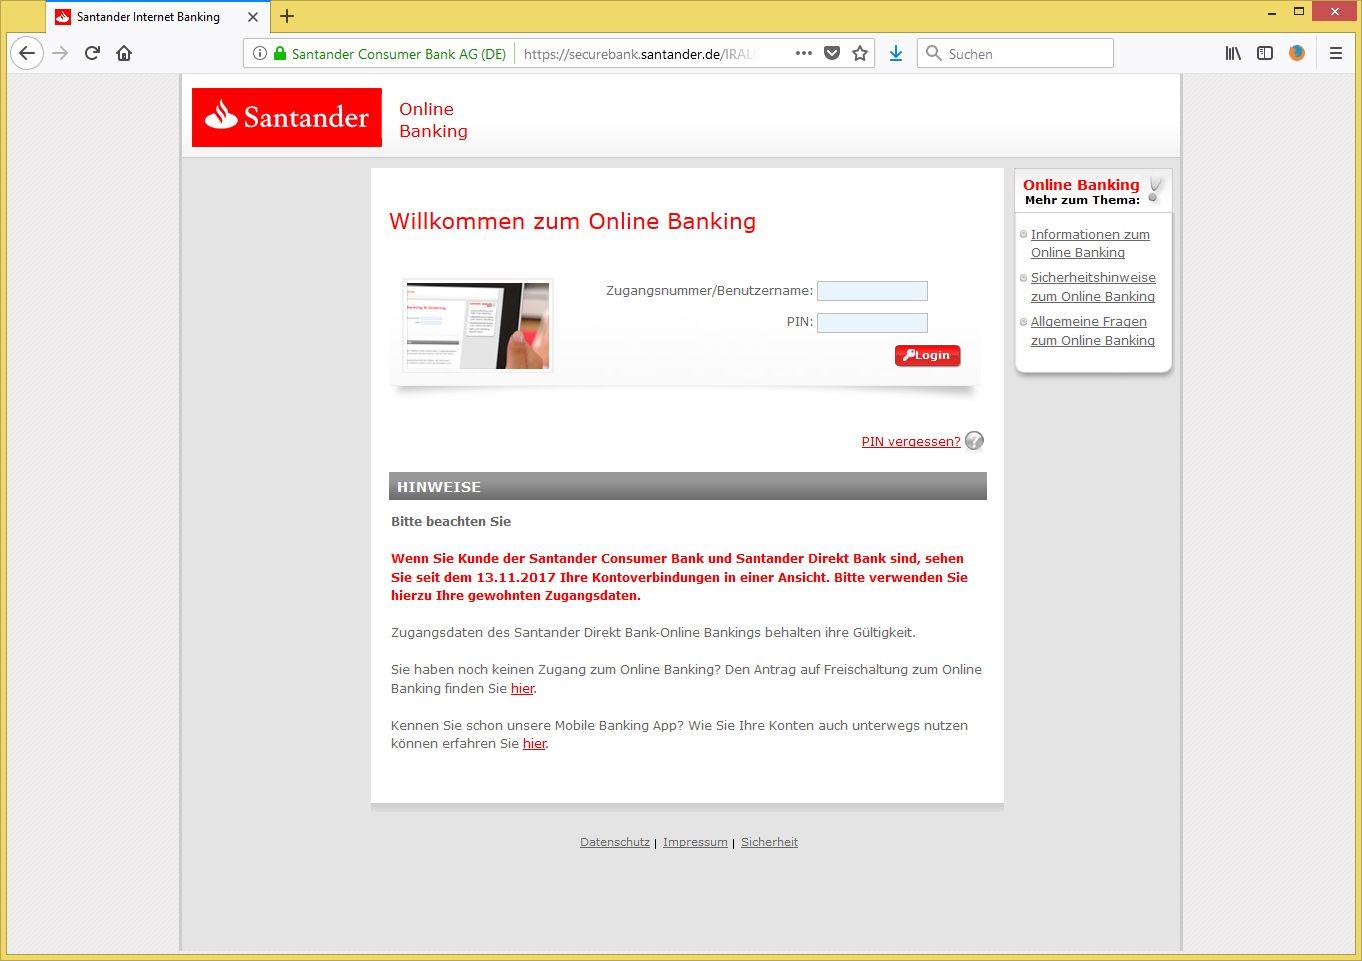 Www Santander Consumer Bank Online Banking